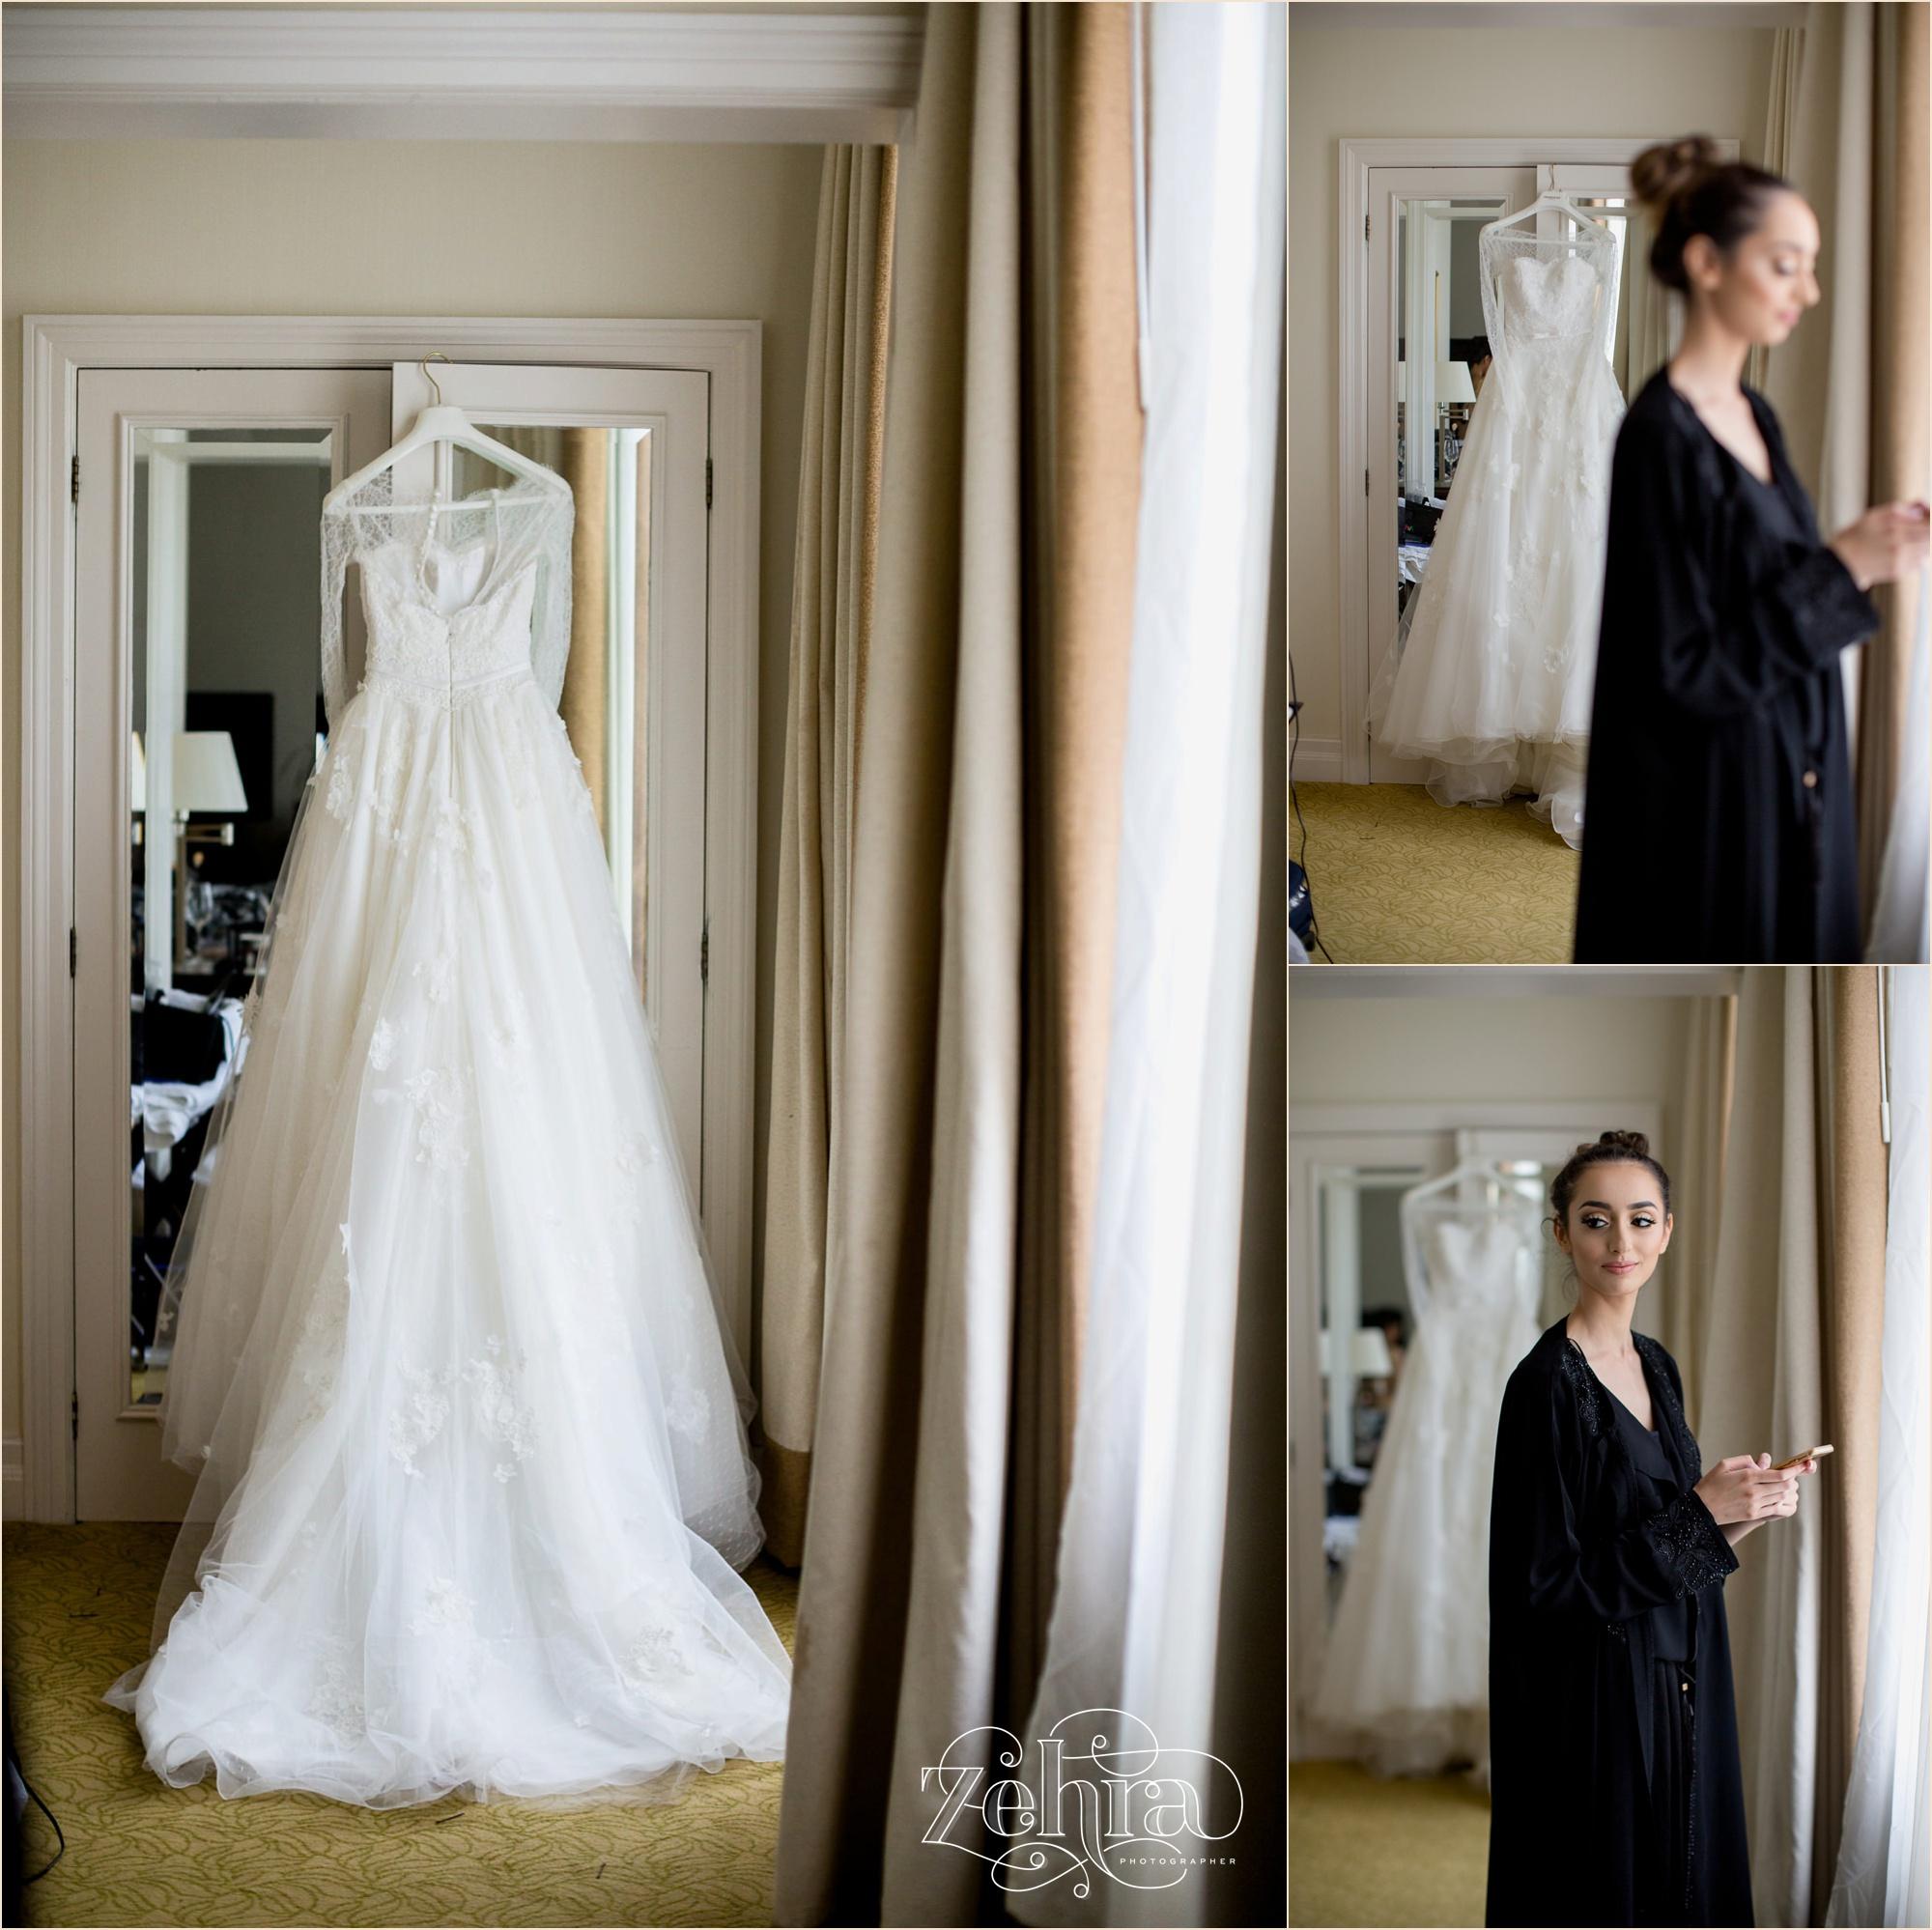 jasira manchester wedding photographer_0003.jpg